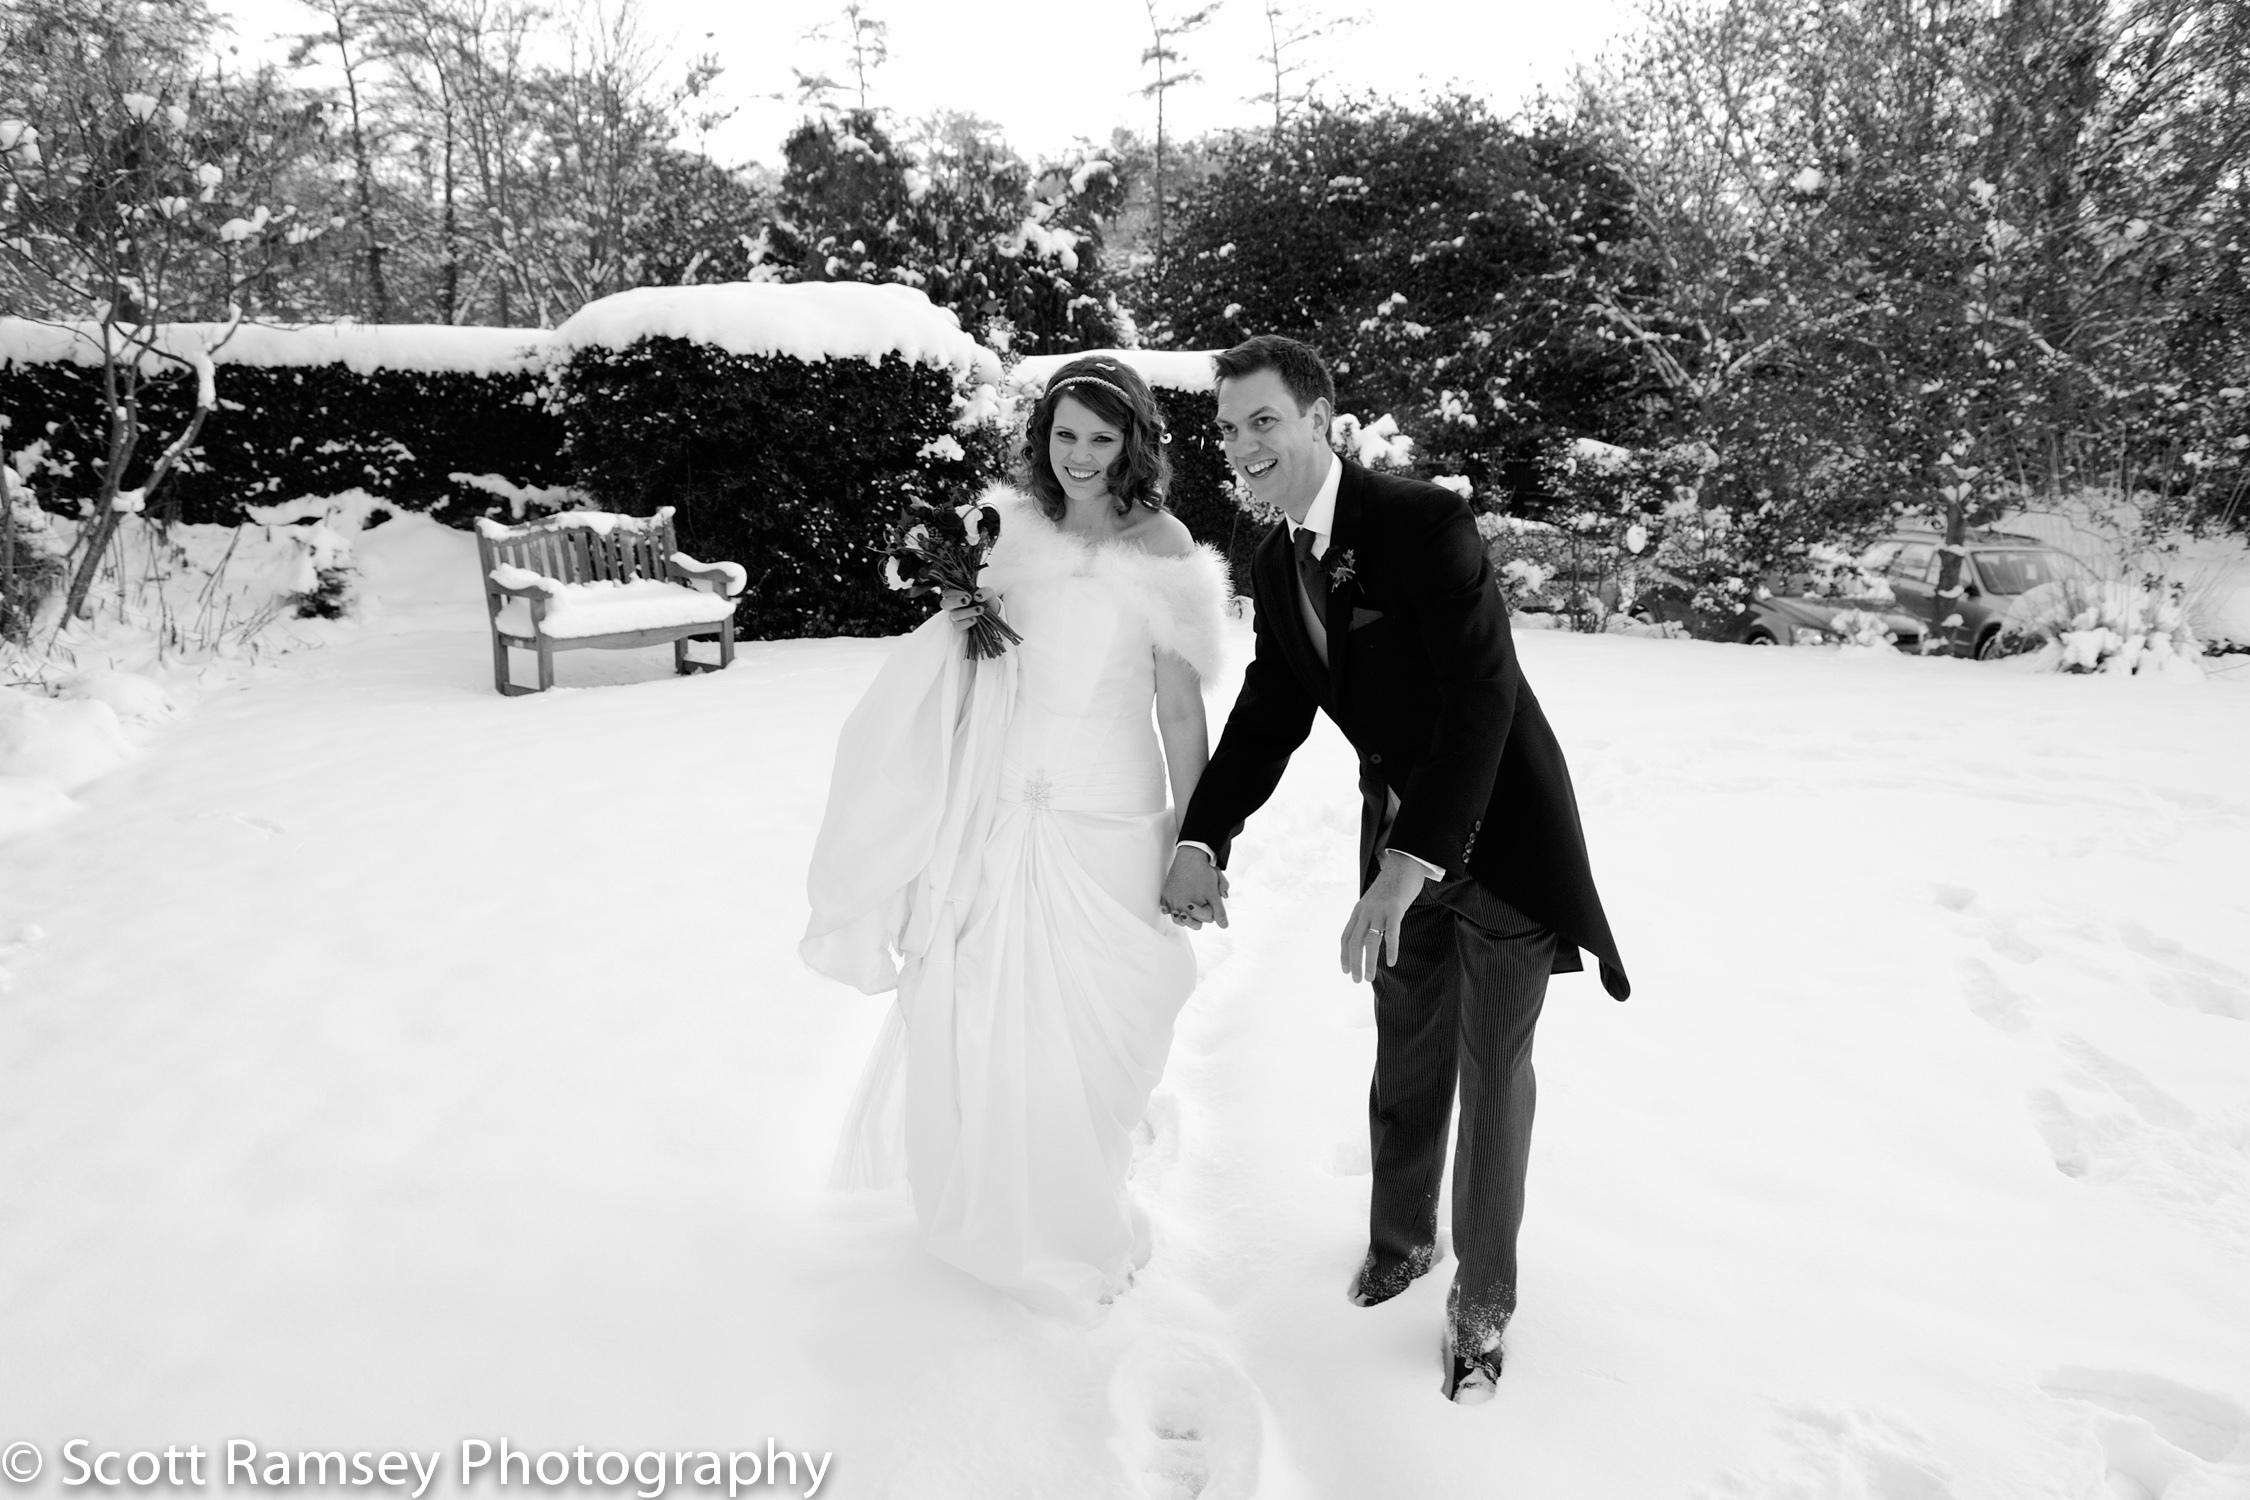 Winter-Wedding-Spread-Eagle-Hotel-Midhurst-Bride-Groom-Laughing-